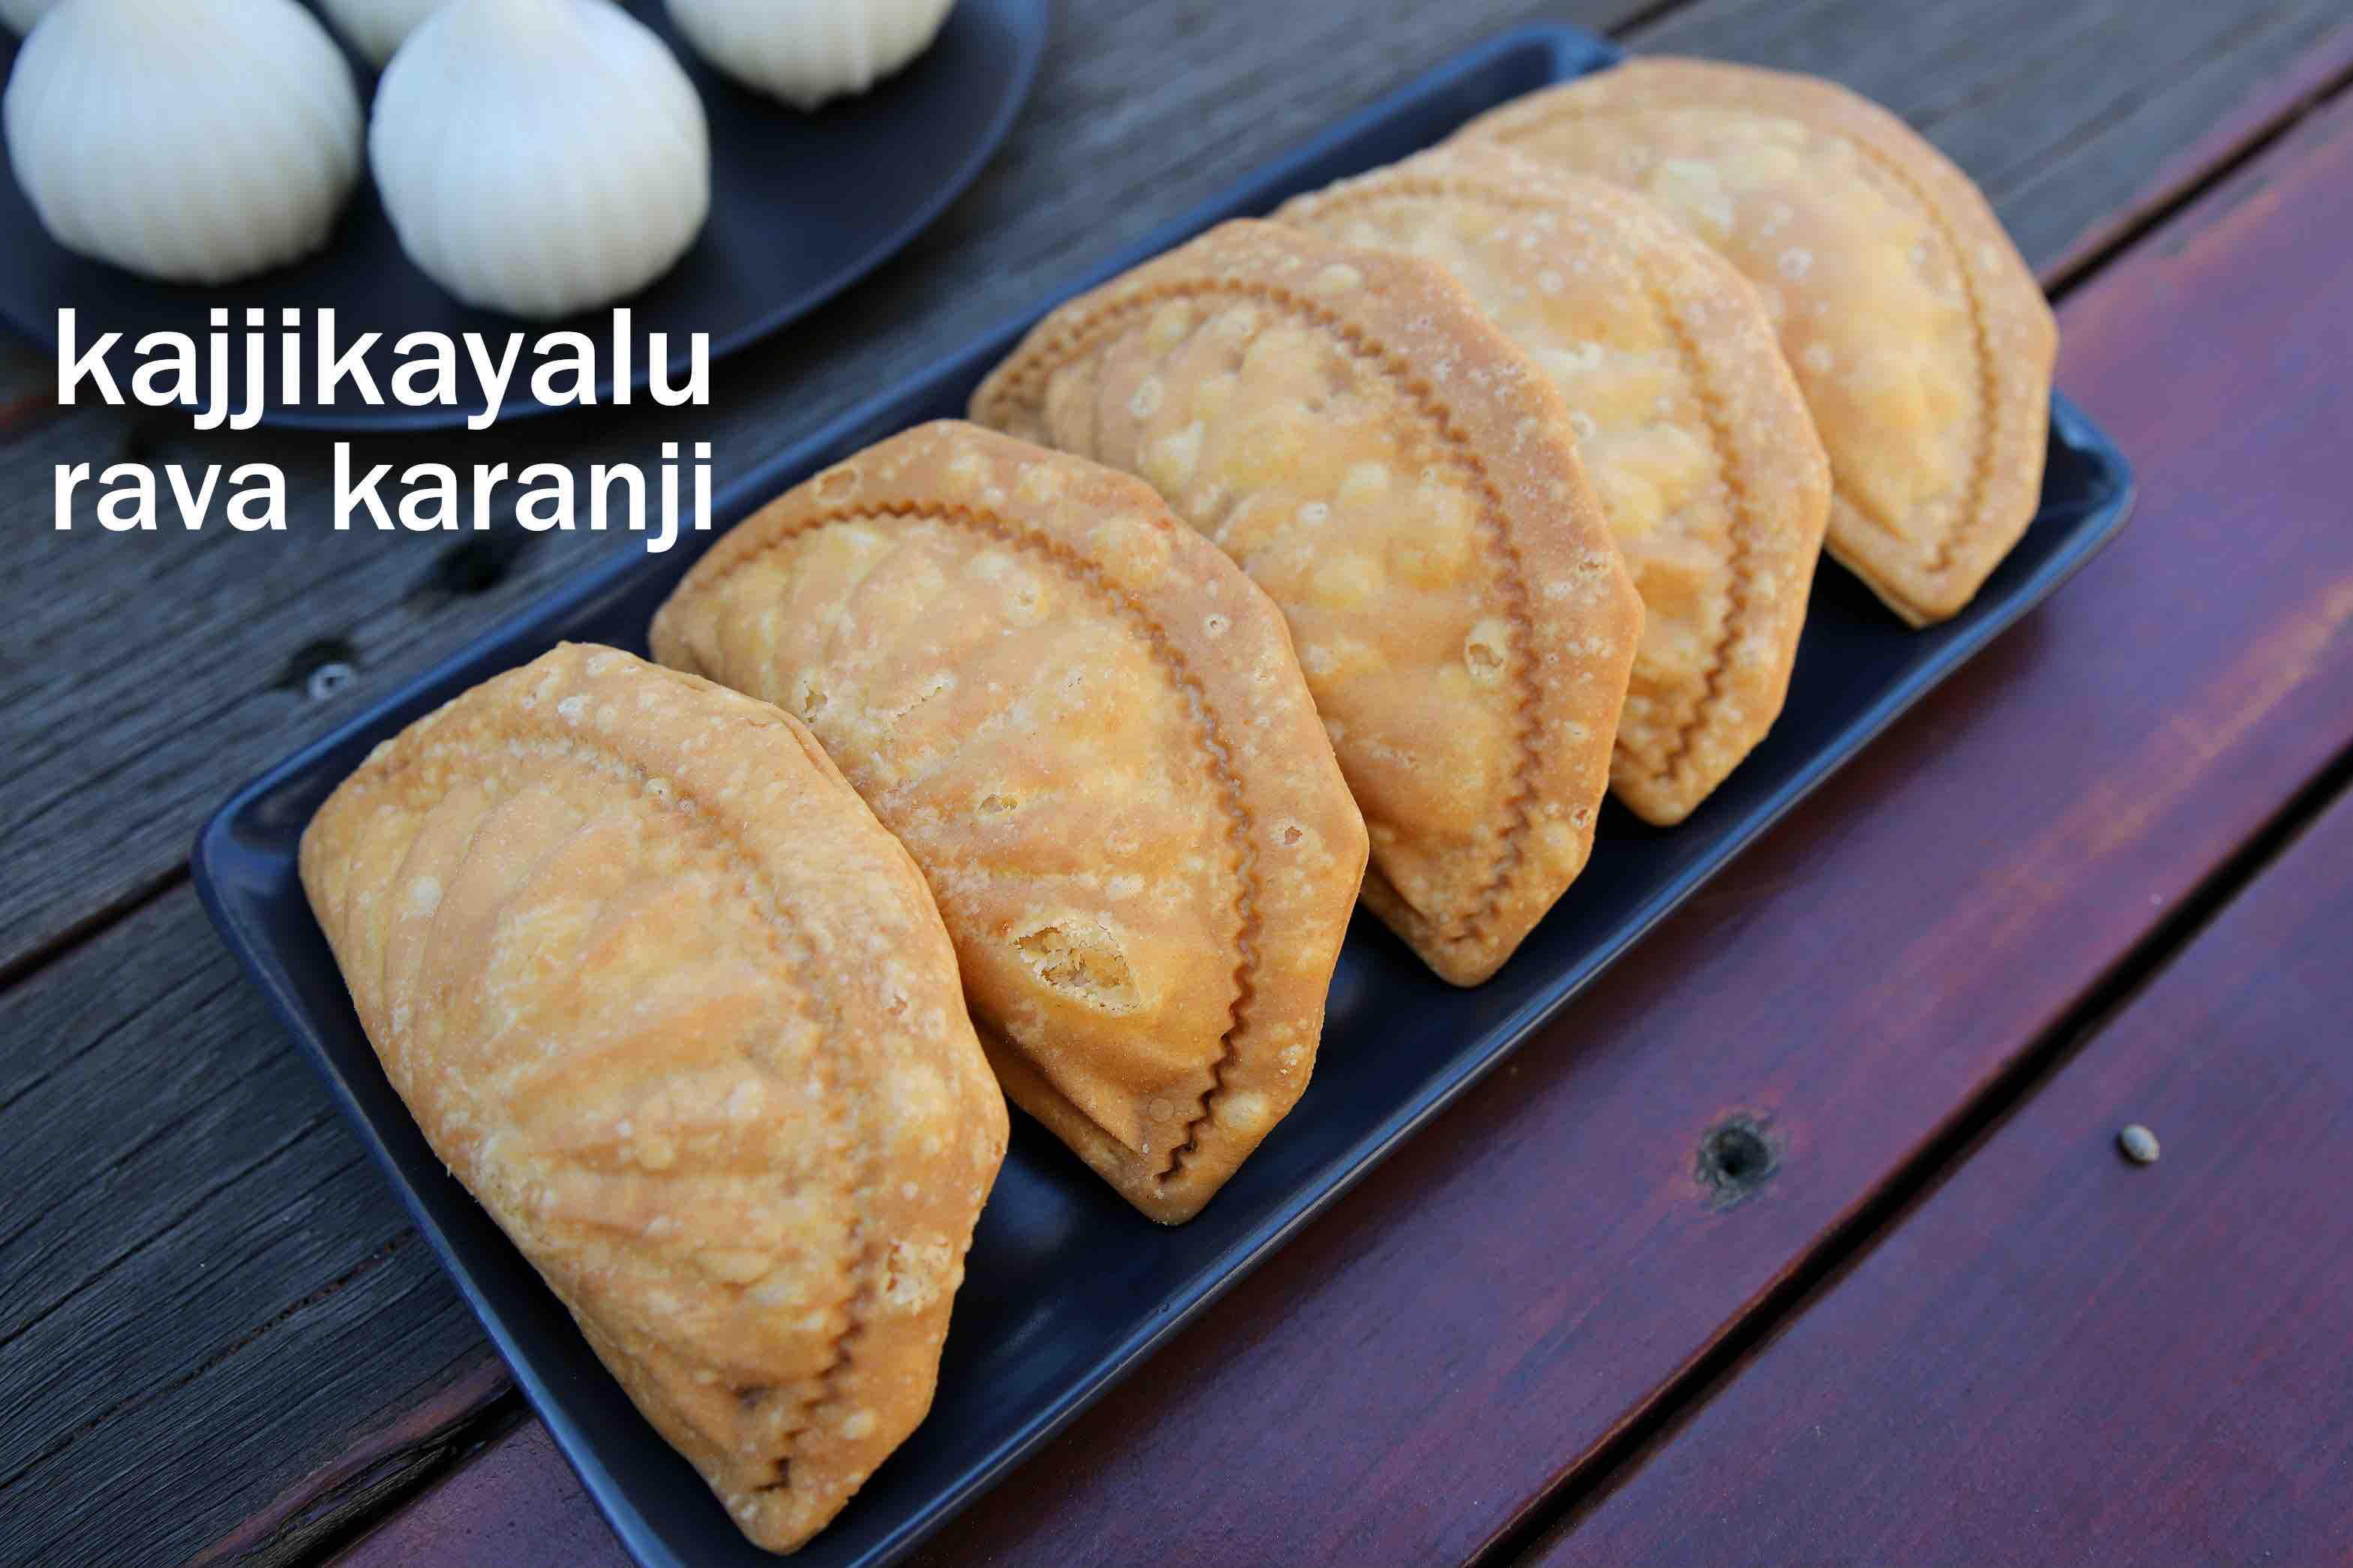 kajjikayalu recipe | suji karanji recipe | ravakajjikayalu | semolina gujiya